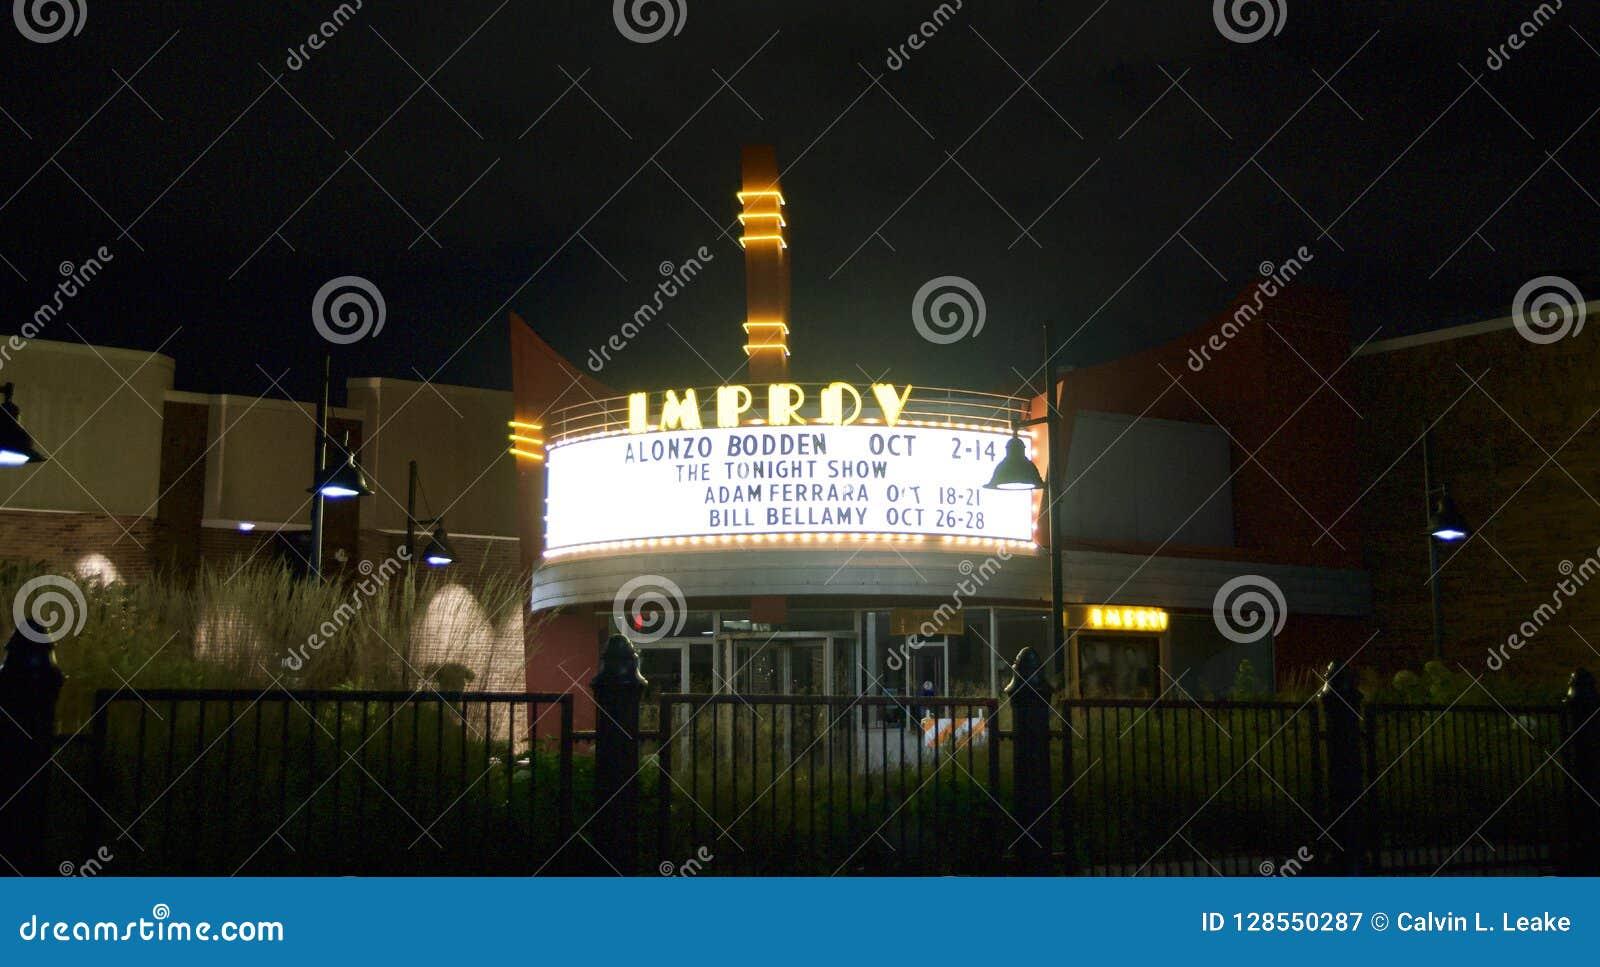 Improv Comedey Club, Woodfield Mall, Schaumburg, IL